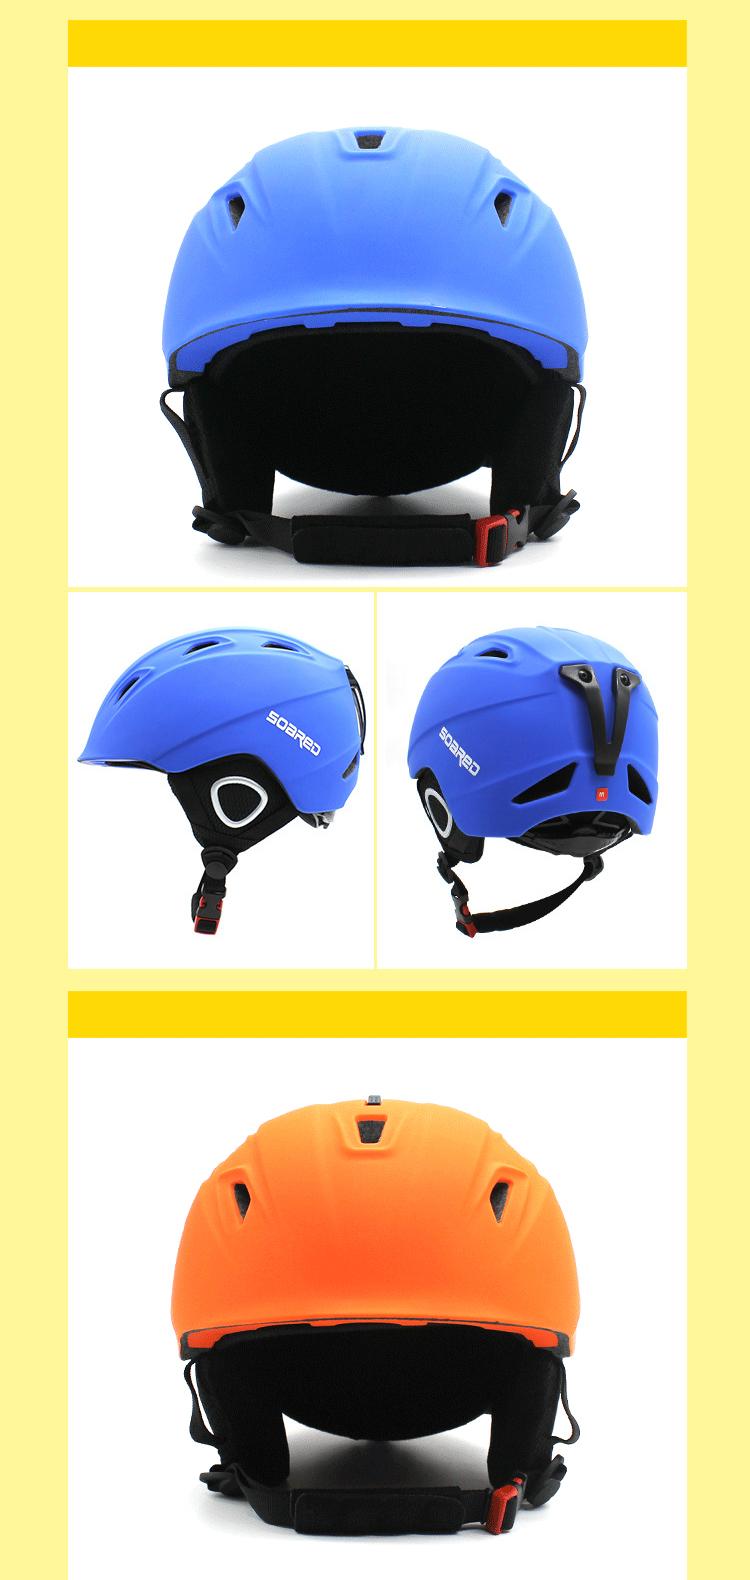 SOARED Winter Professional Kids Helmets Children Skiing Snow Skating Skateboard Helmet Sports Helmet